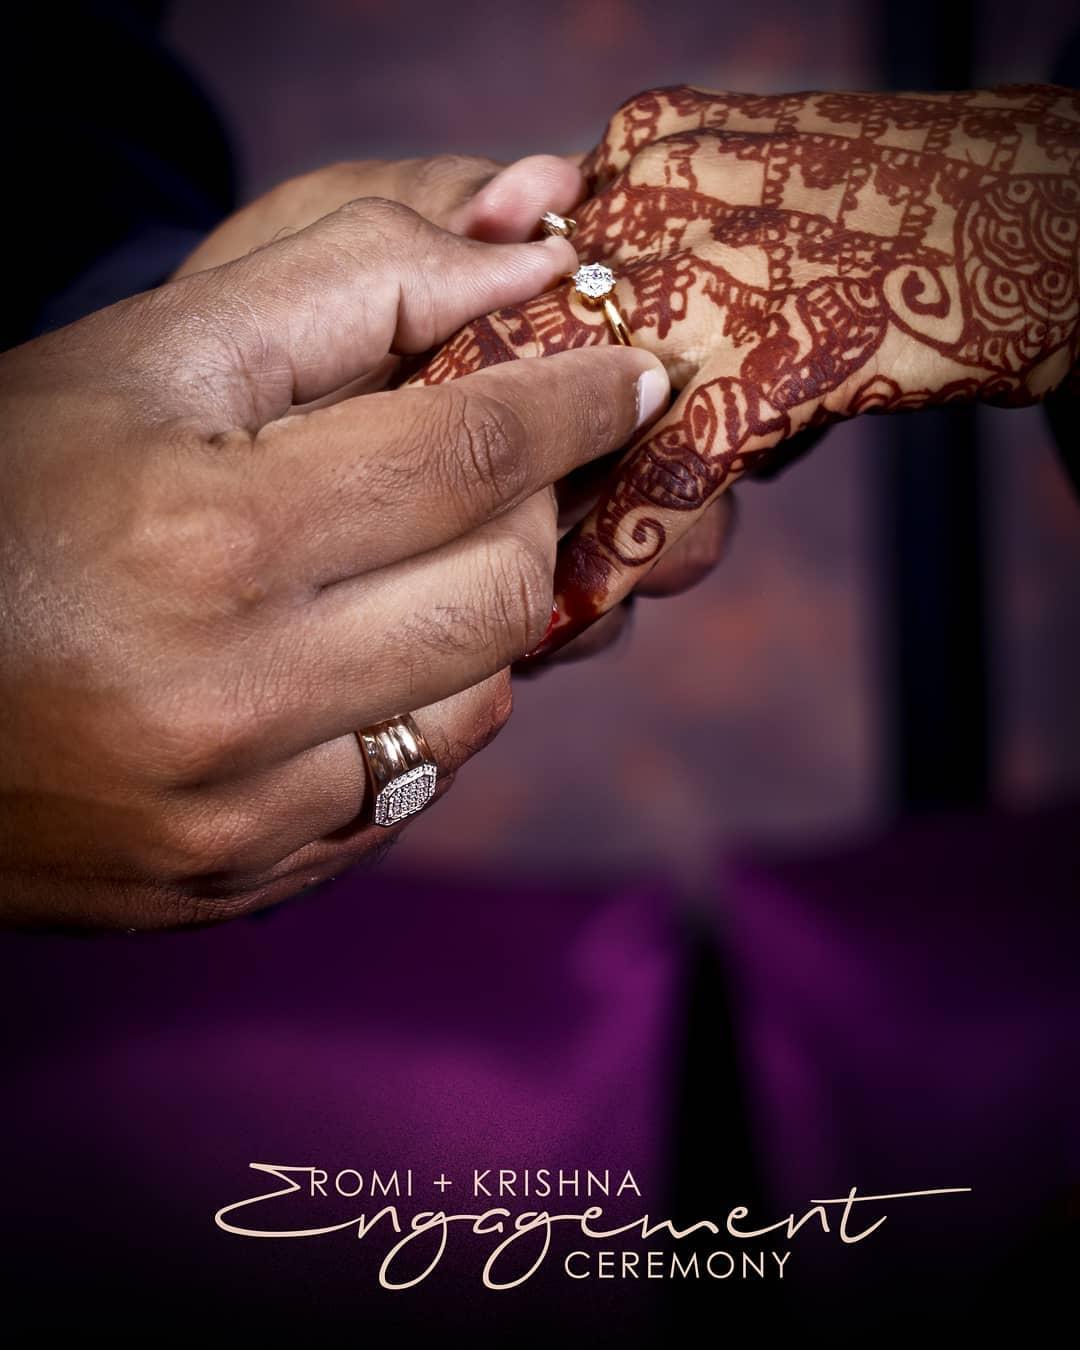 We've decided on Forever... Engagement ceremony :: Krishna + Romi 💑 ✨✨✨✨✨✨✨✨✨✨✨✨✨✨✨✨✨ Engagement / Ring Ceremony Shoot: #dipmementophotography Insta: @dip_memento_photography @dipthakkar.clicker https://www.facebook.com/photographybydip/ https://mementophotography.xyz ✨✨✨✨✨✨✨✨✨✨✨✨✨✨✨✨✨ #engagement #photography #ahmedabad #ringceremony #india #indian #photo #photography #photographer #pic #storiesofindia #candidshoot #indianphotography  #indianphotographers #canvasofindia #weddingportrait #streetphotographyindia  #ahmedabad #oph #official_photographers_hub #indianshutterbugs #indiaclicks #_coi #india_everyday #i_hobbygraphy #igersoftheday #ahmedabad_diaries #dslr_official #weddingphotographer #indianphotography #photographers_of_india #destinationwedding